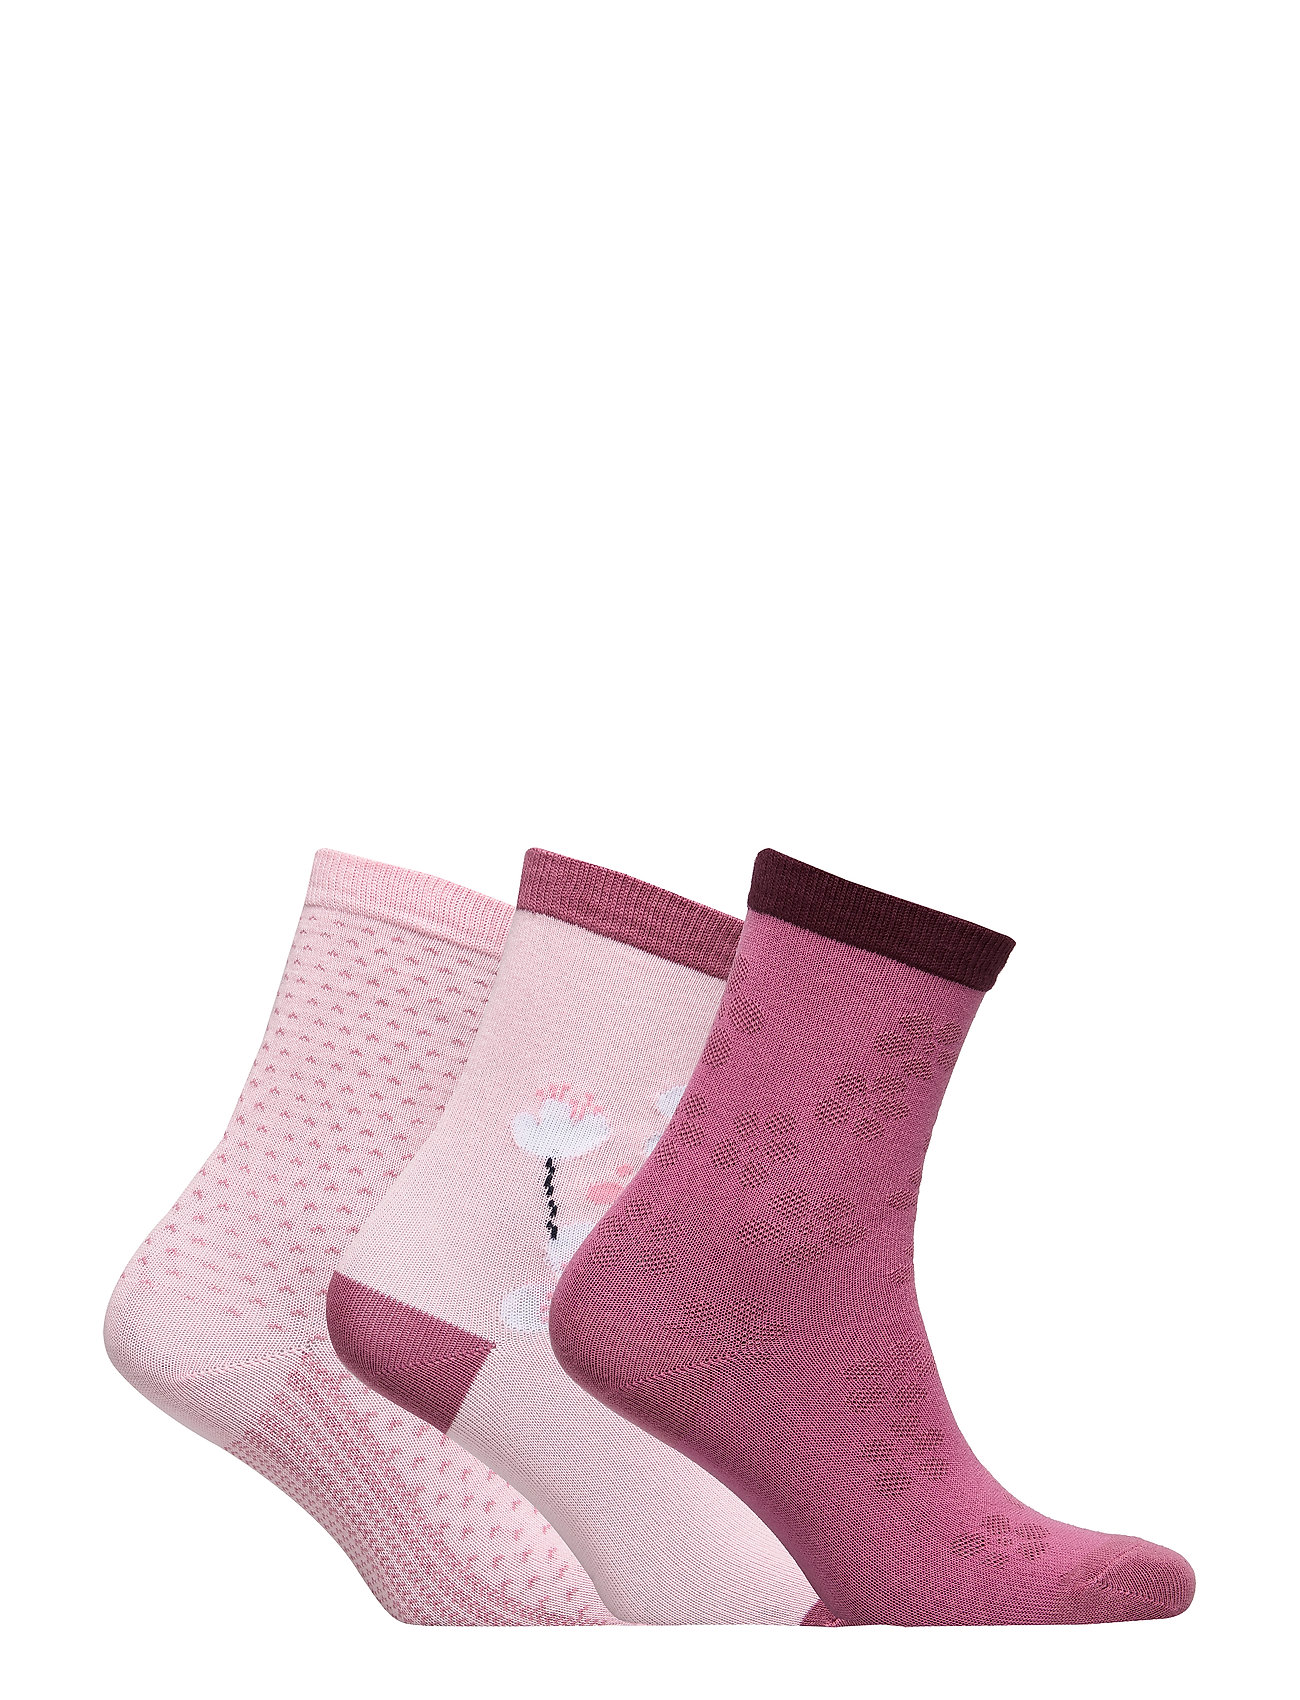 Polarn O. Pyret Socks 3-P Jaquard Preschool - ROSE SHADOW